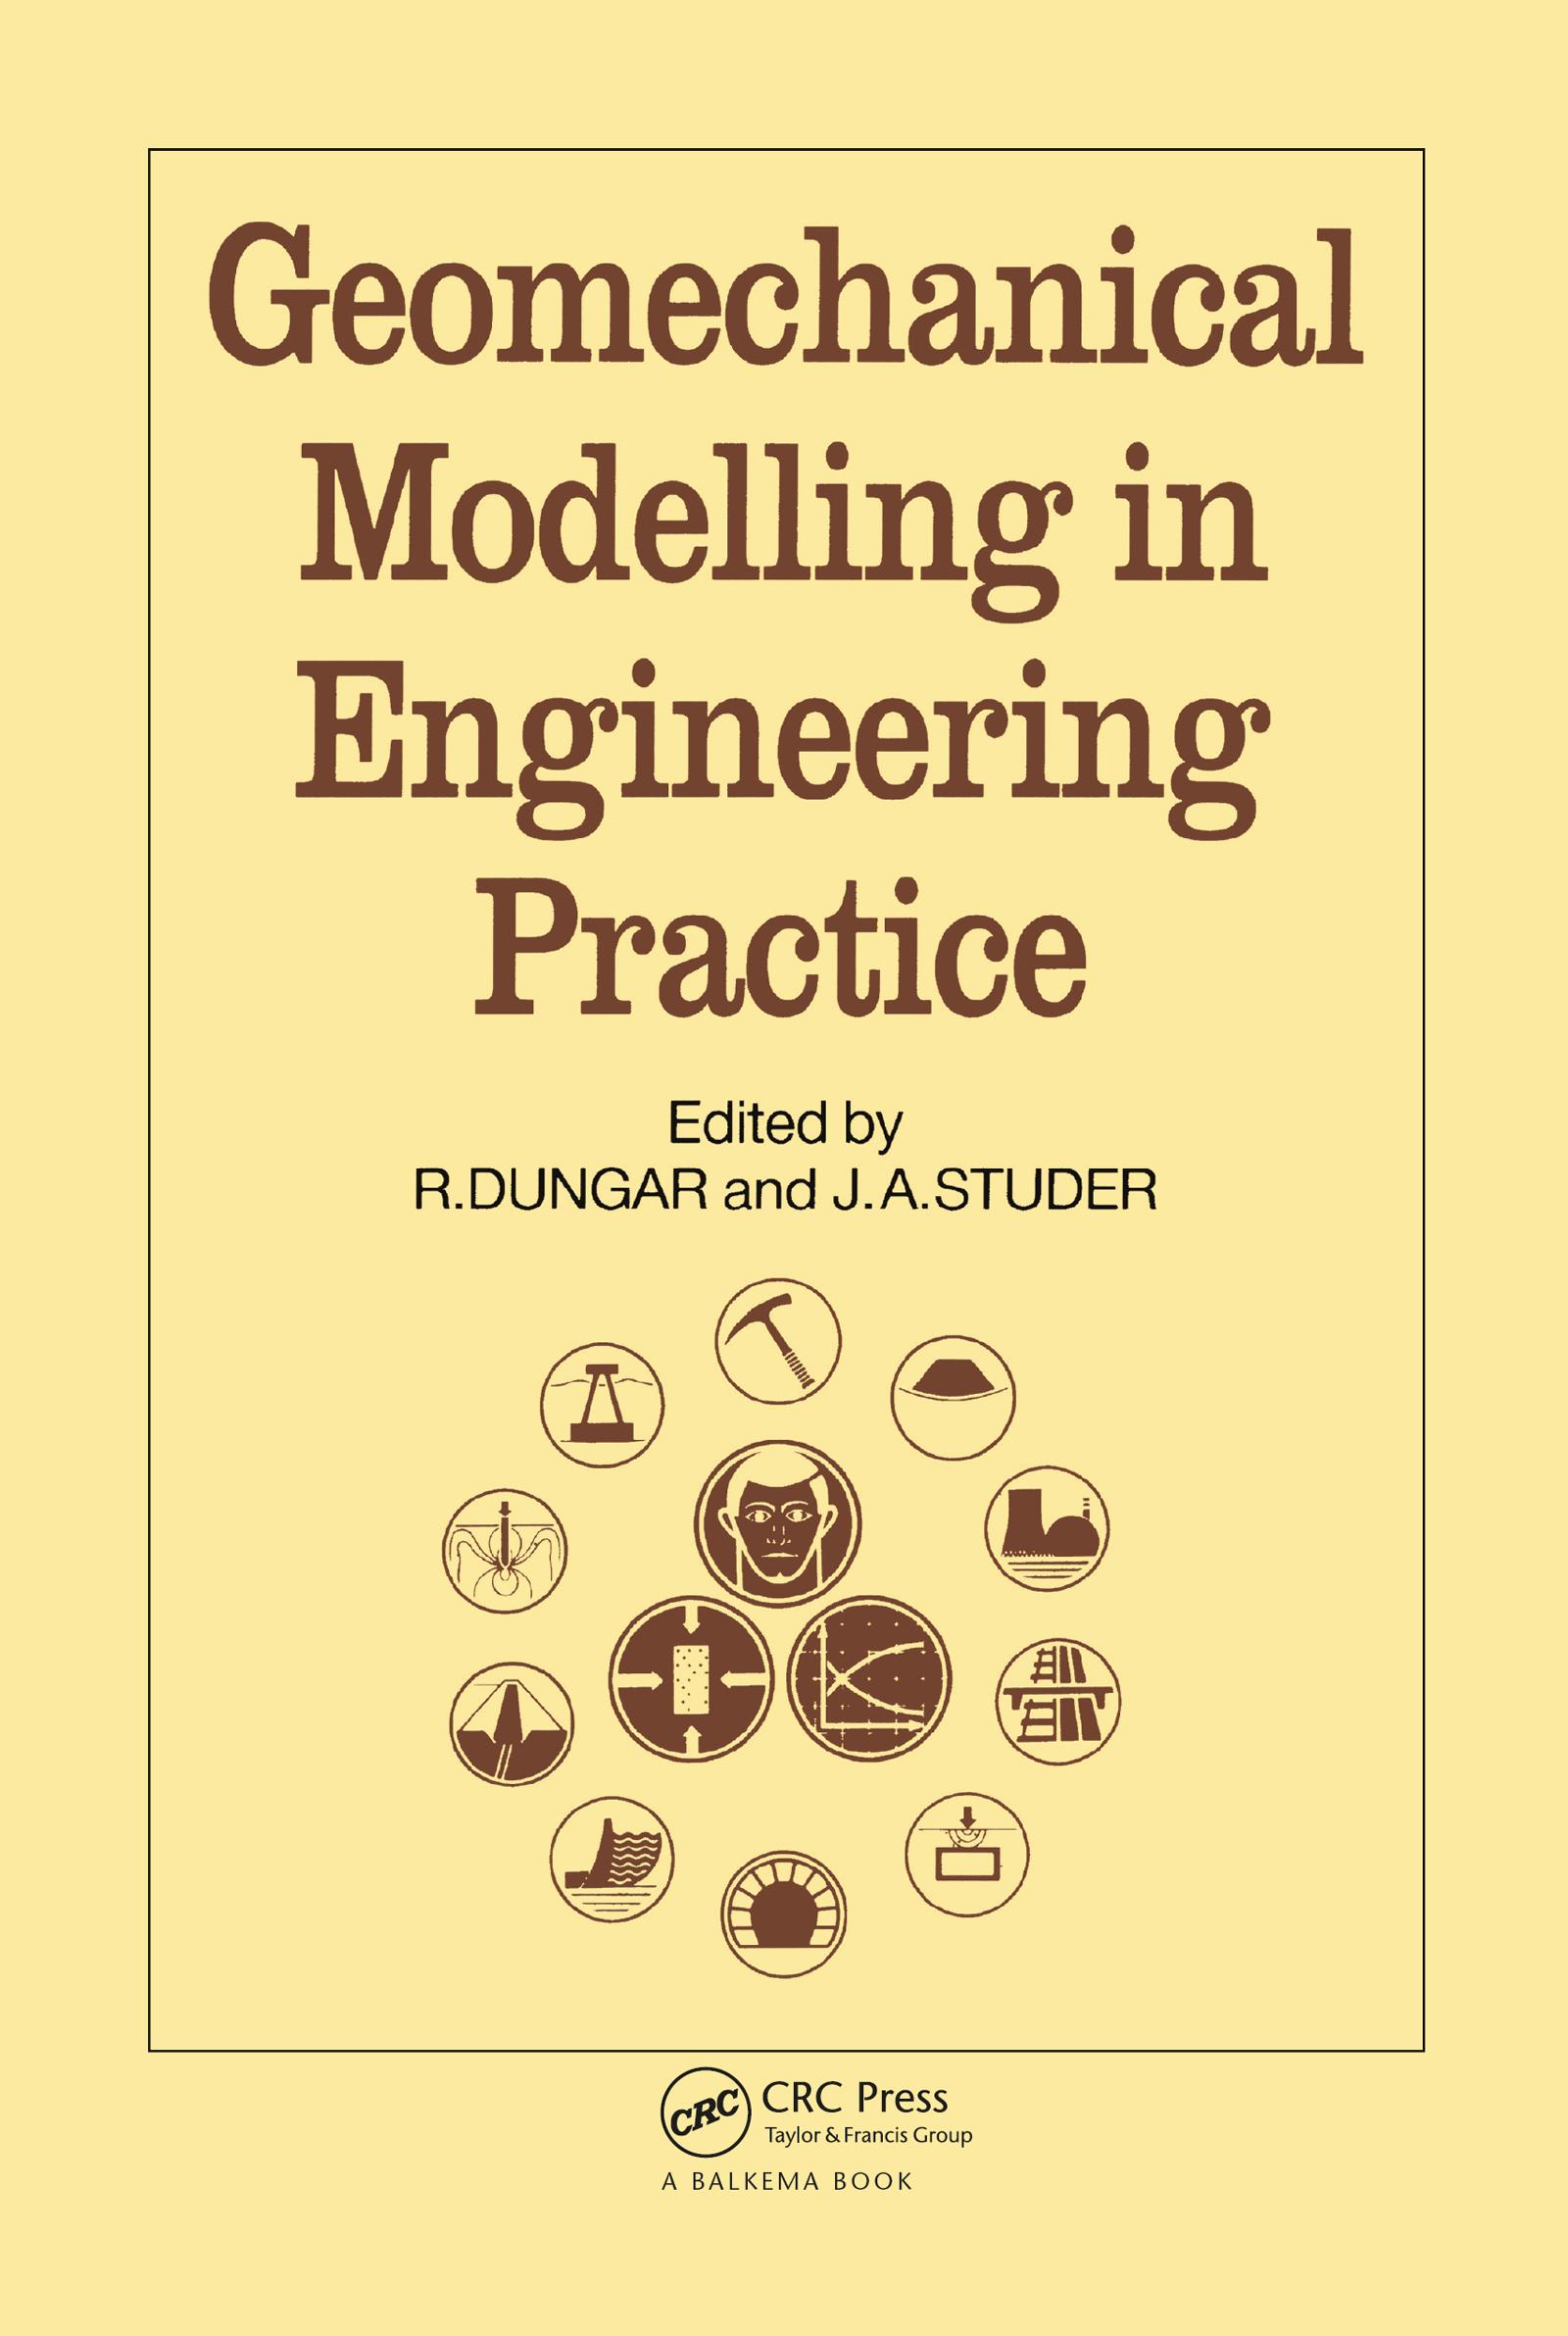 Geomechanical Modelling in Engineering Practice